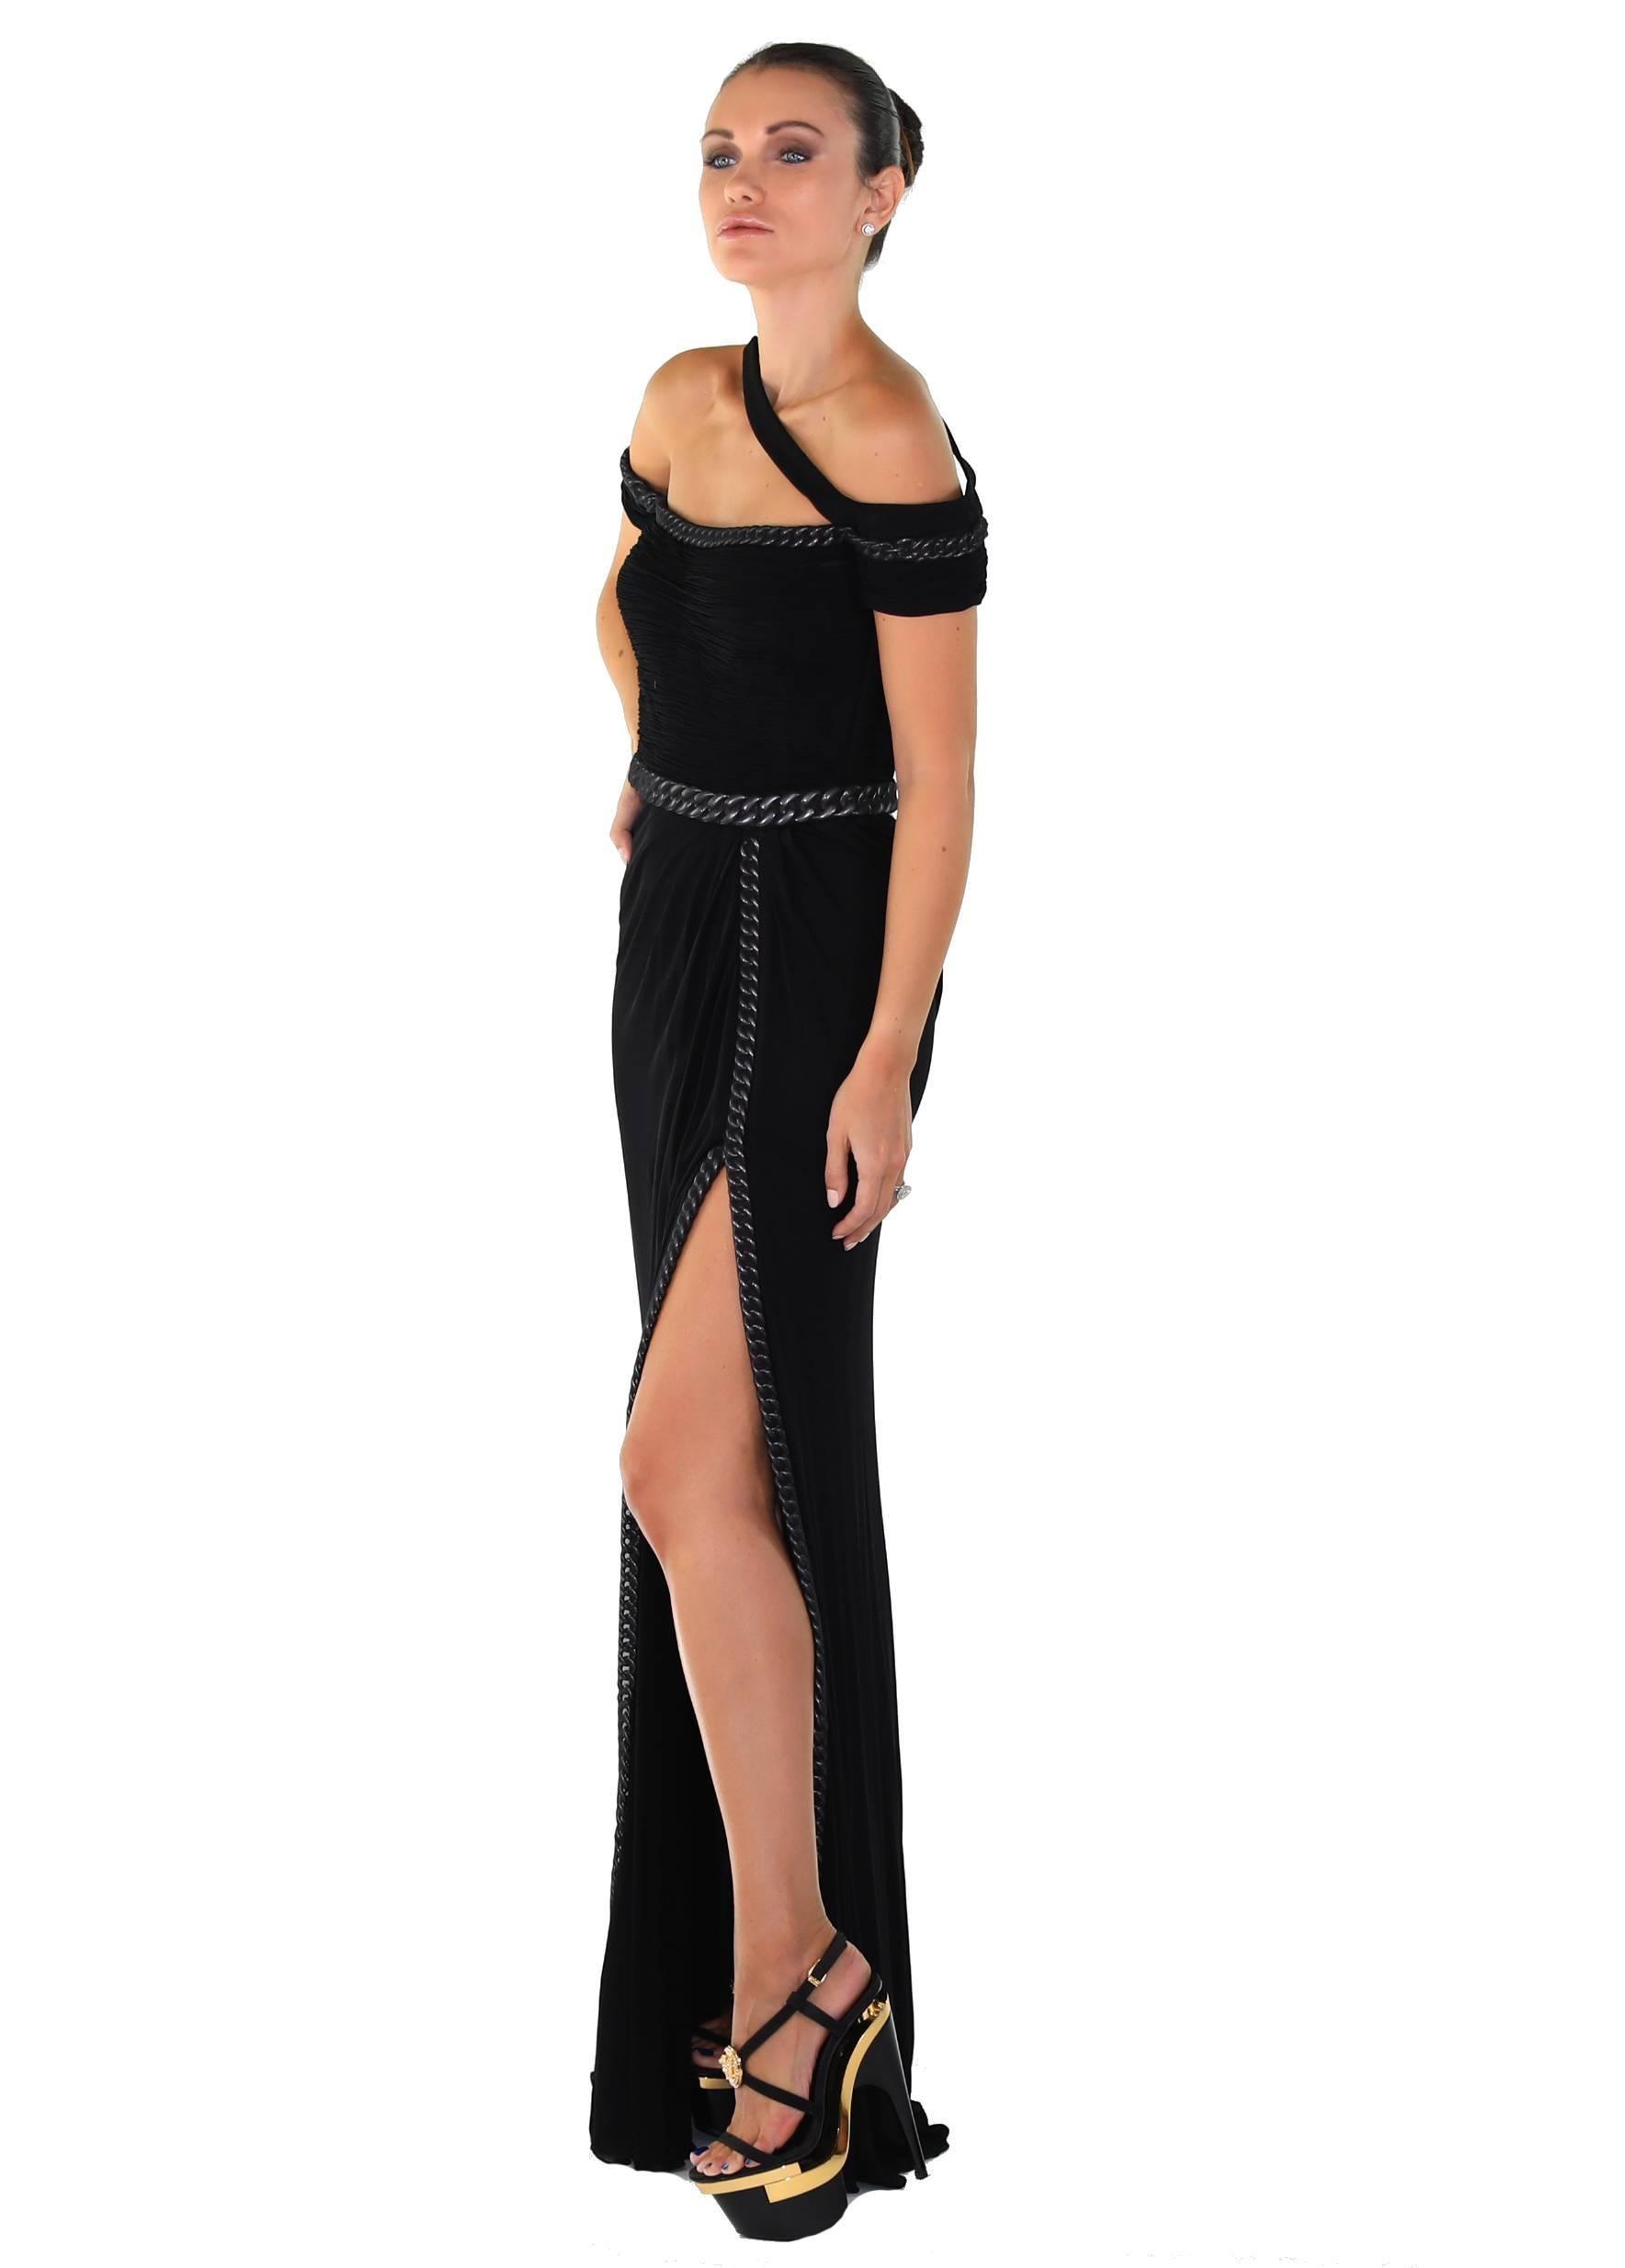 New VERSACE BONDAGE CHAIN EMBELLISHED LONG BLACK DRESS For Sale at ...